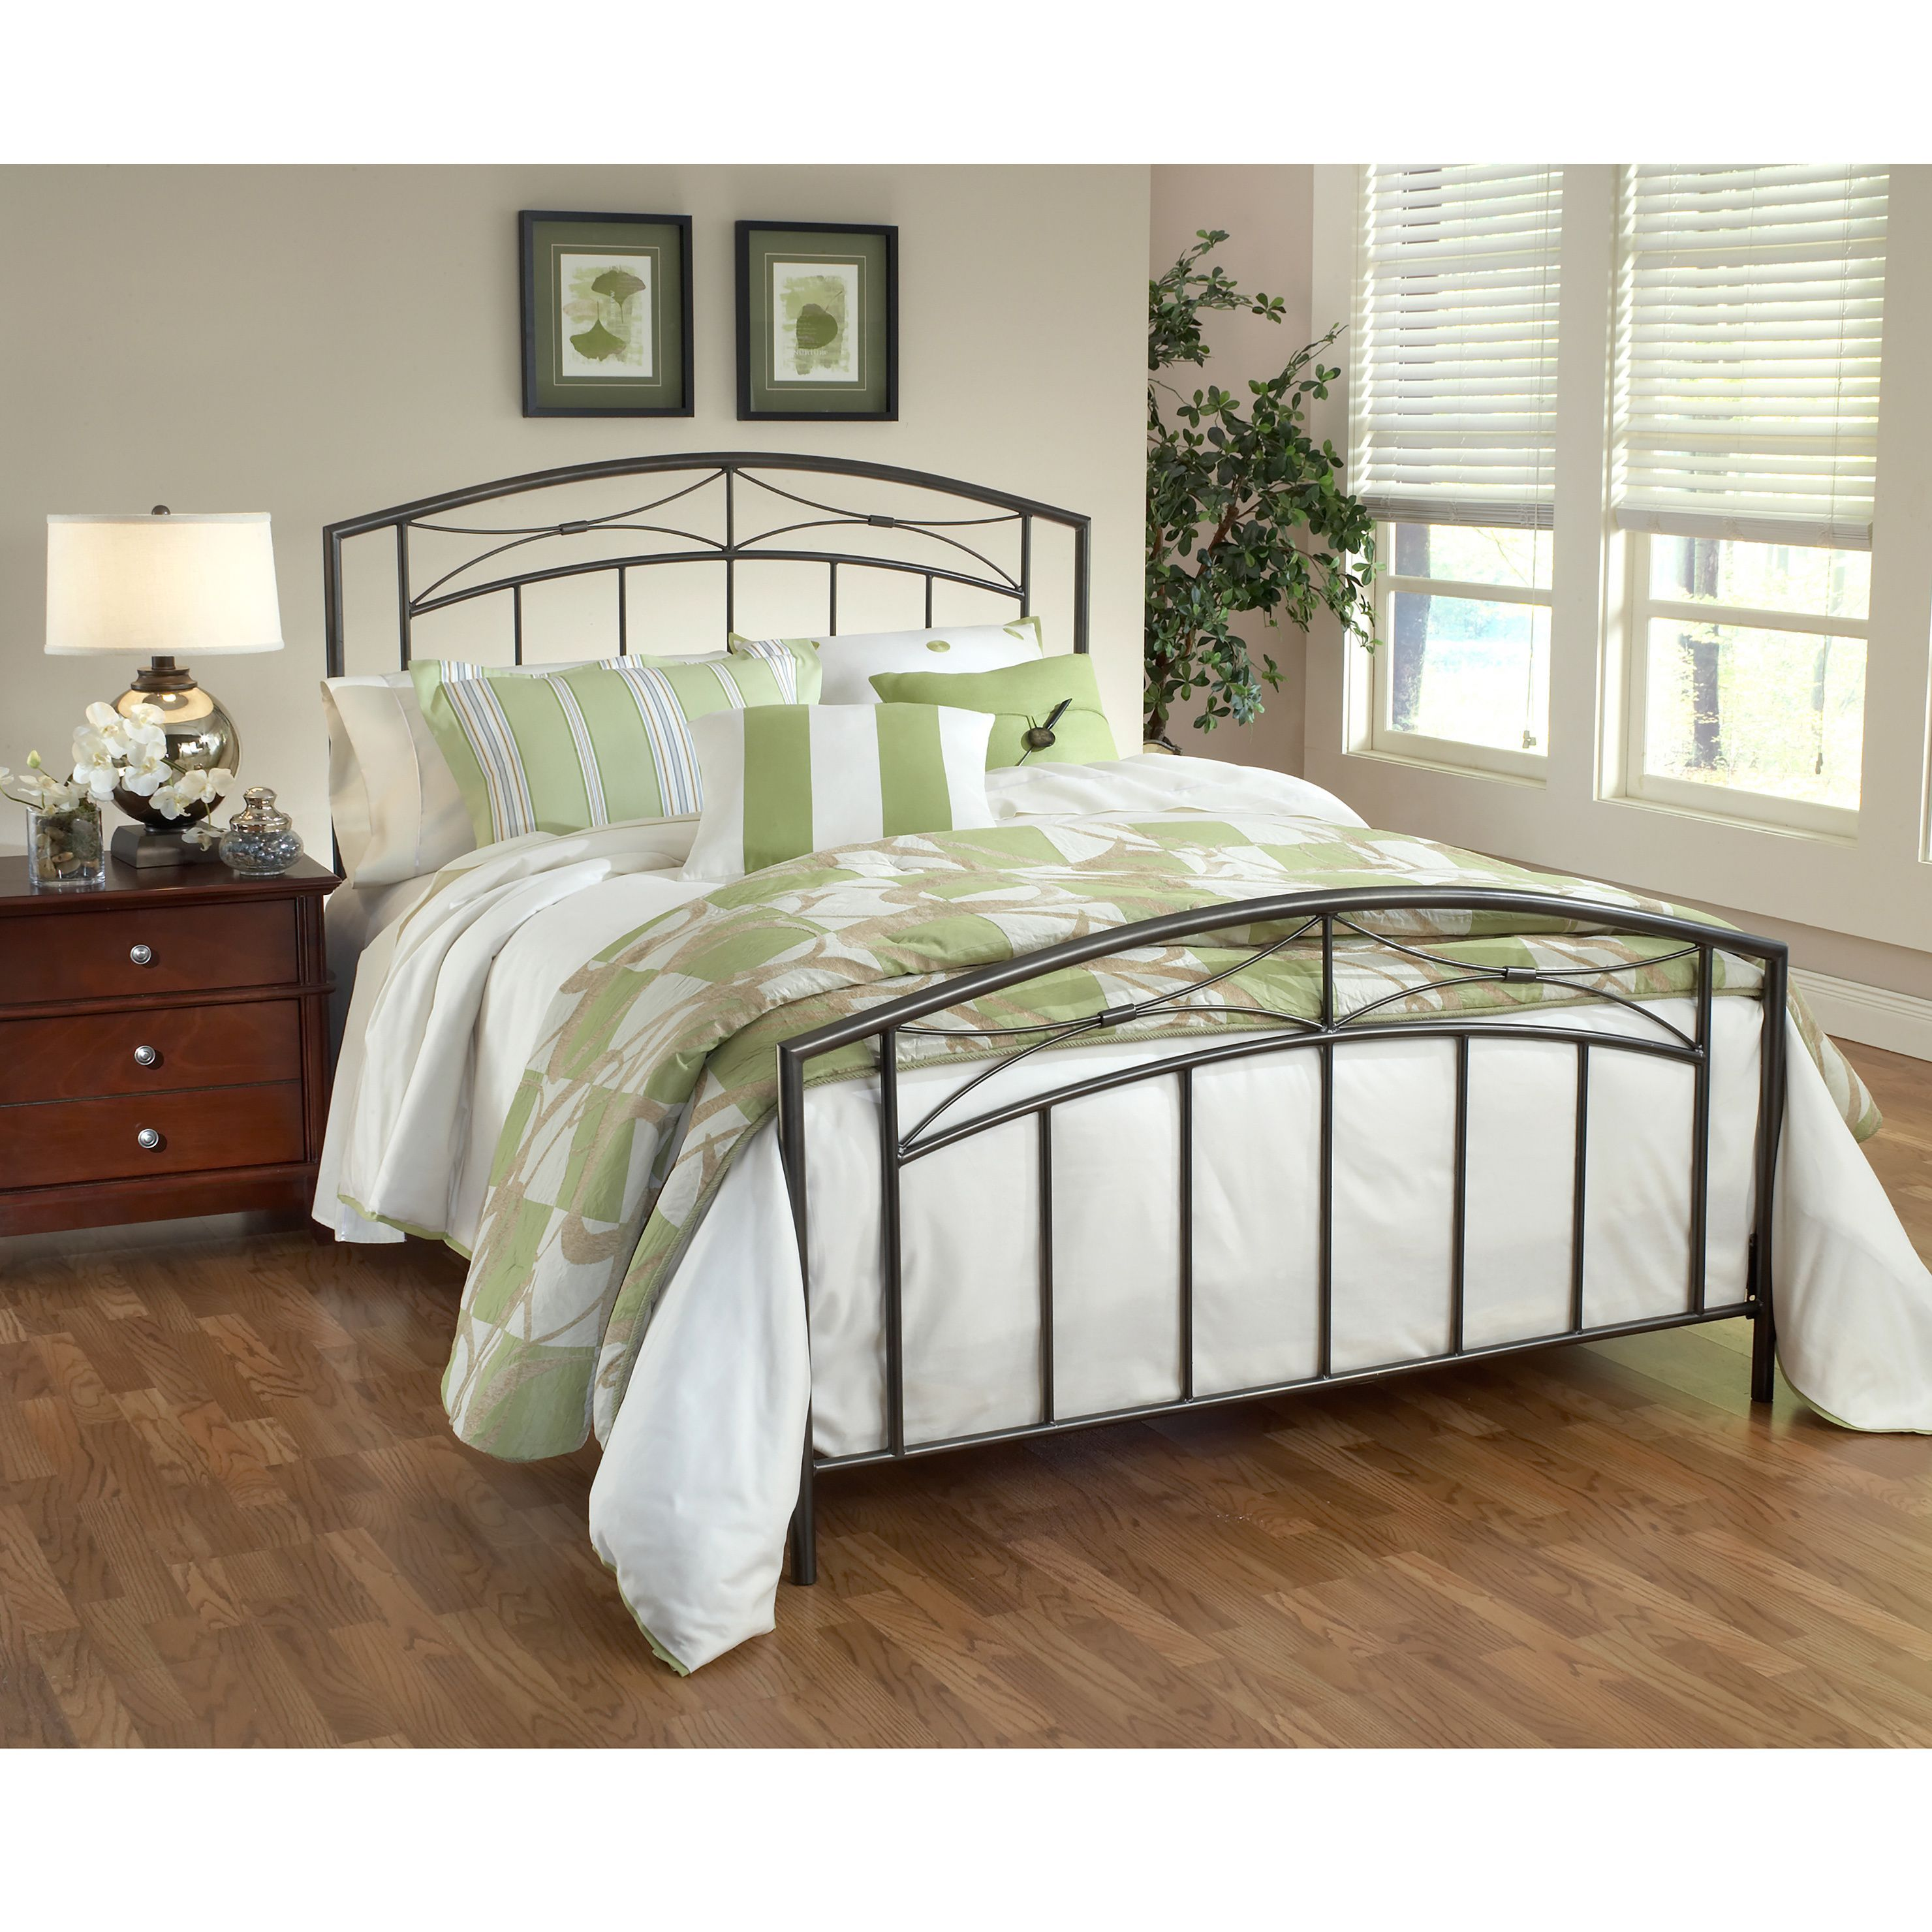 Hillsdale Morris Bed Set (Queen), Silver pewter | Pinterest | Camas